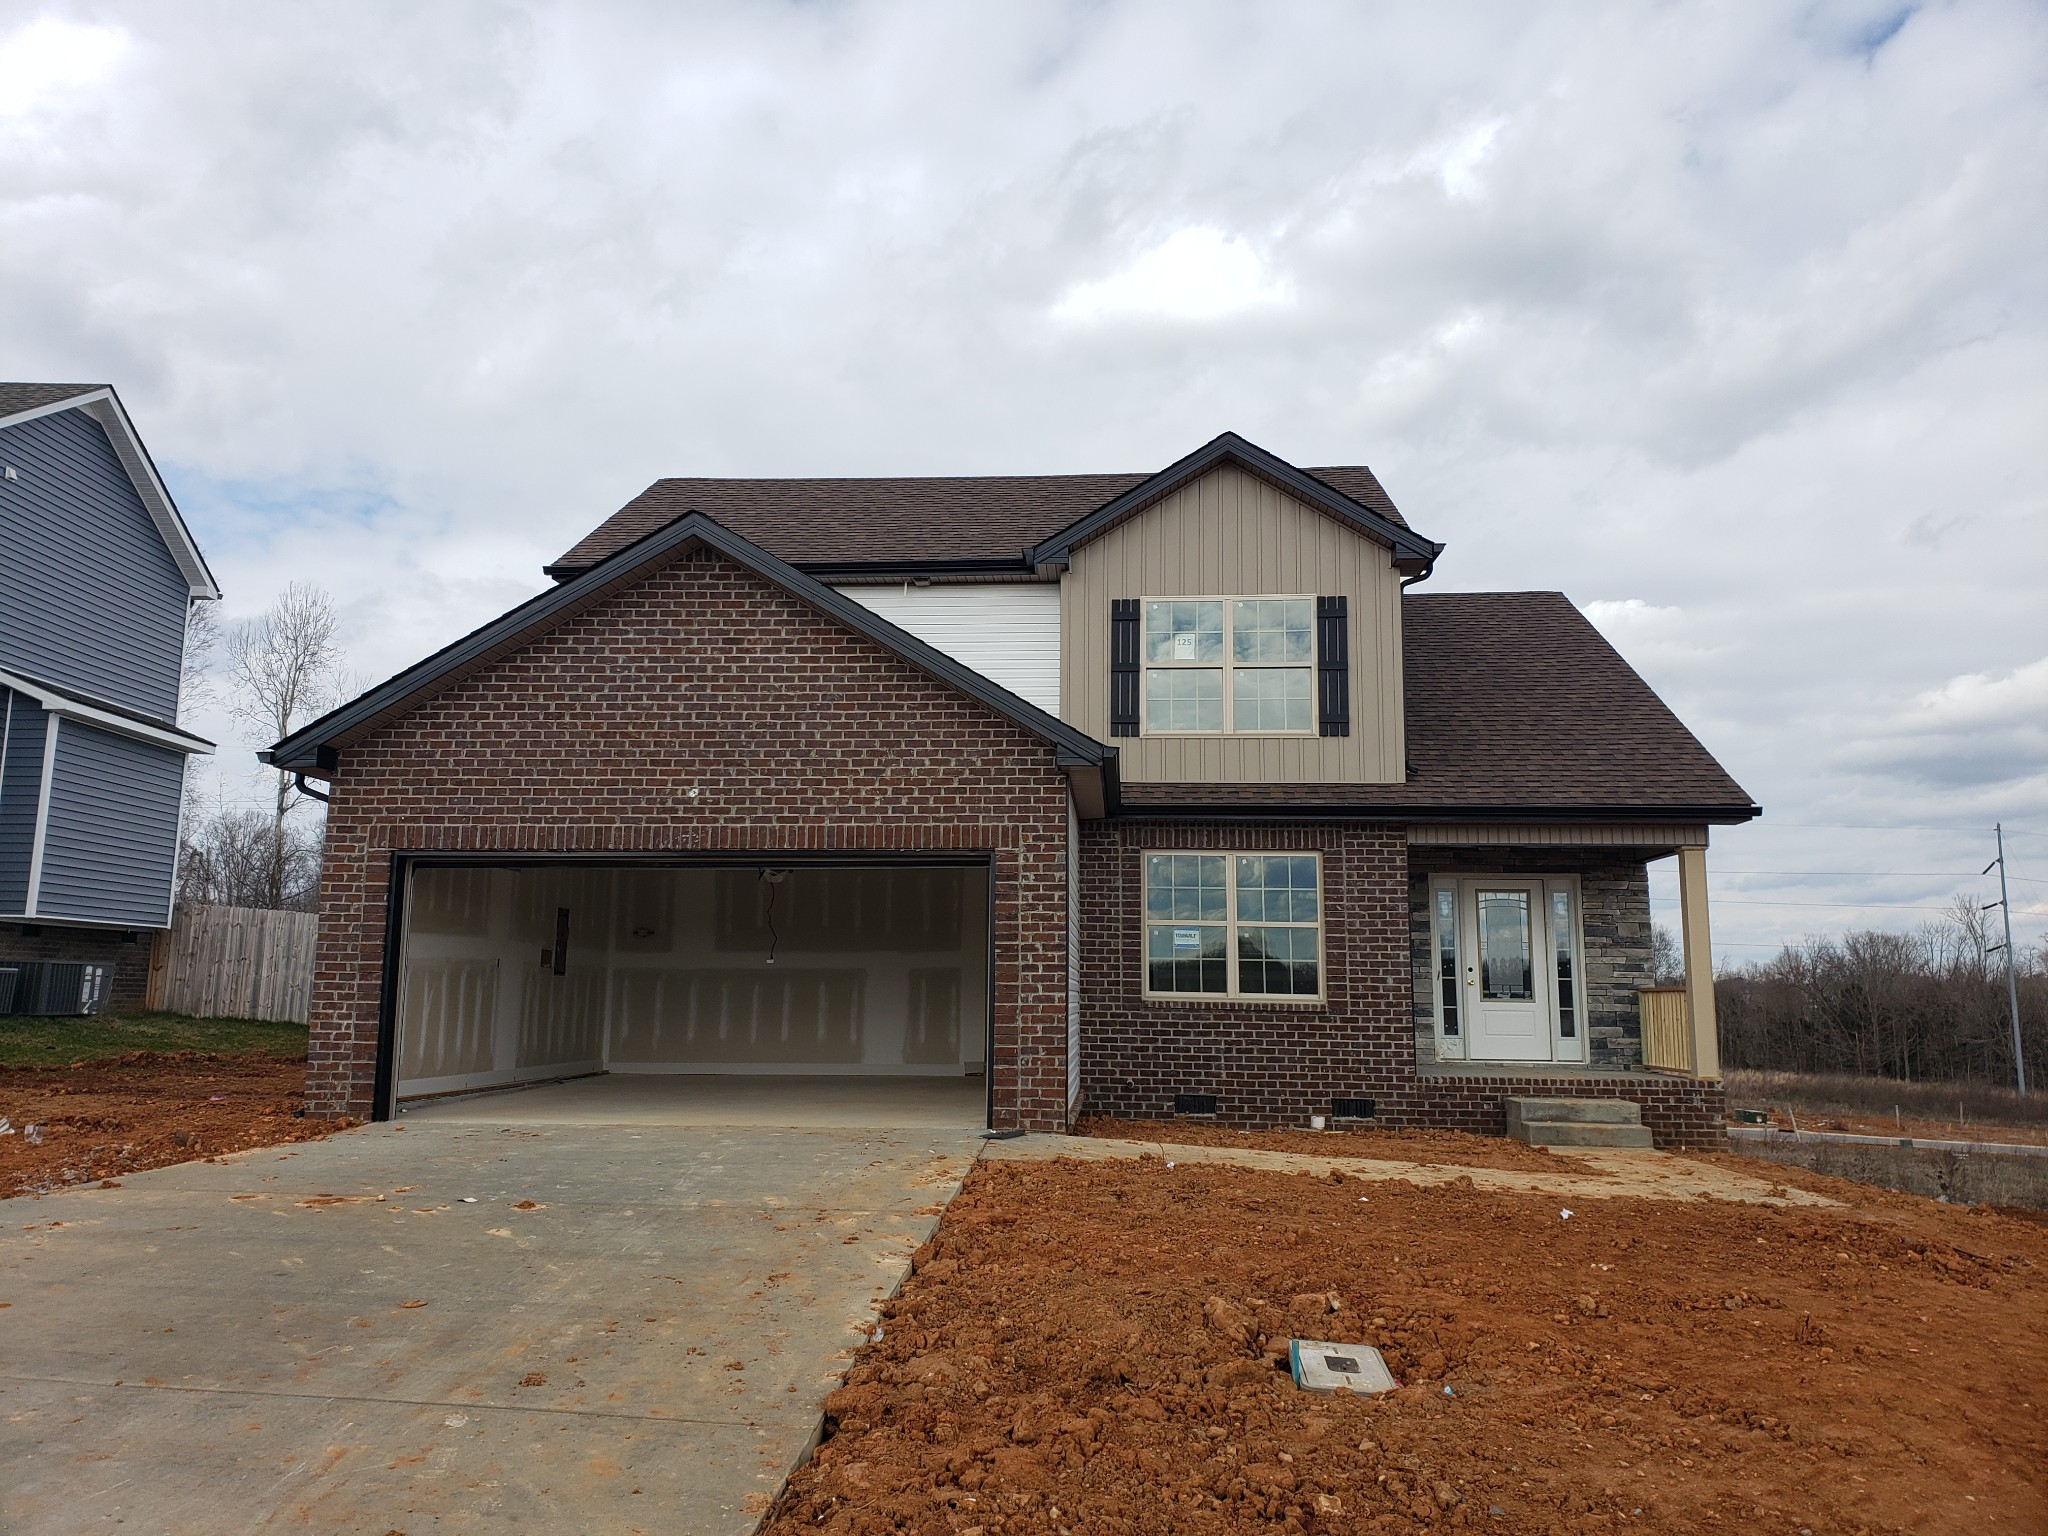 768 Crestone Ln (lot 125), Clarksville, TN 37042 - Clarksville, TN real estate listing